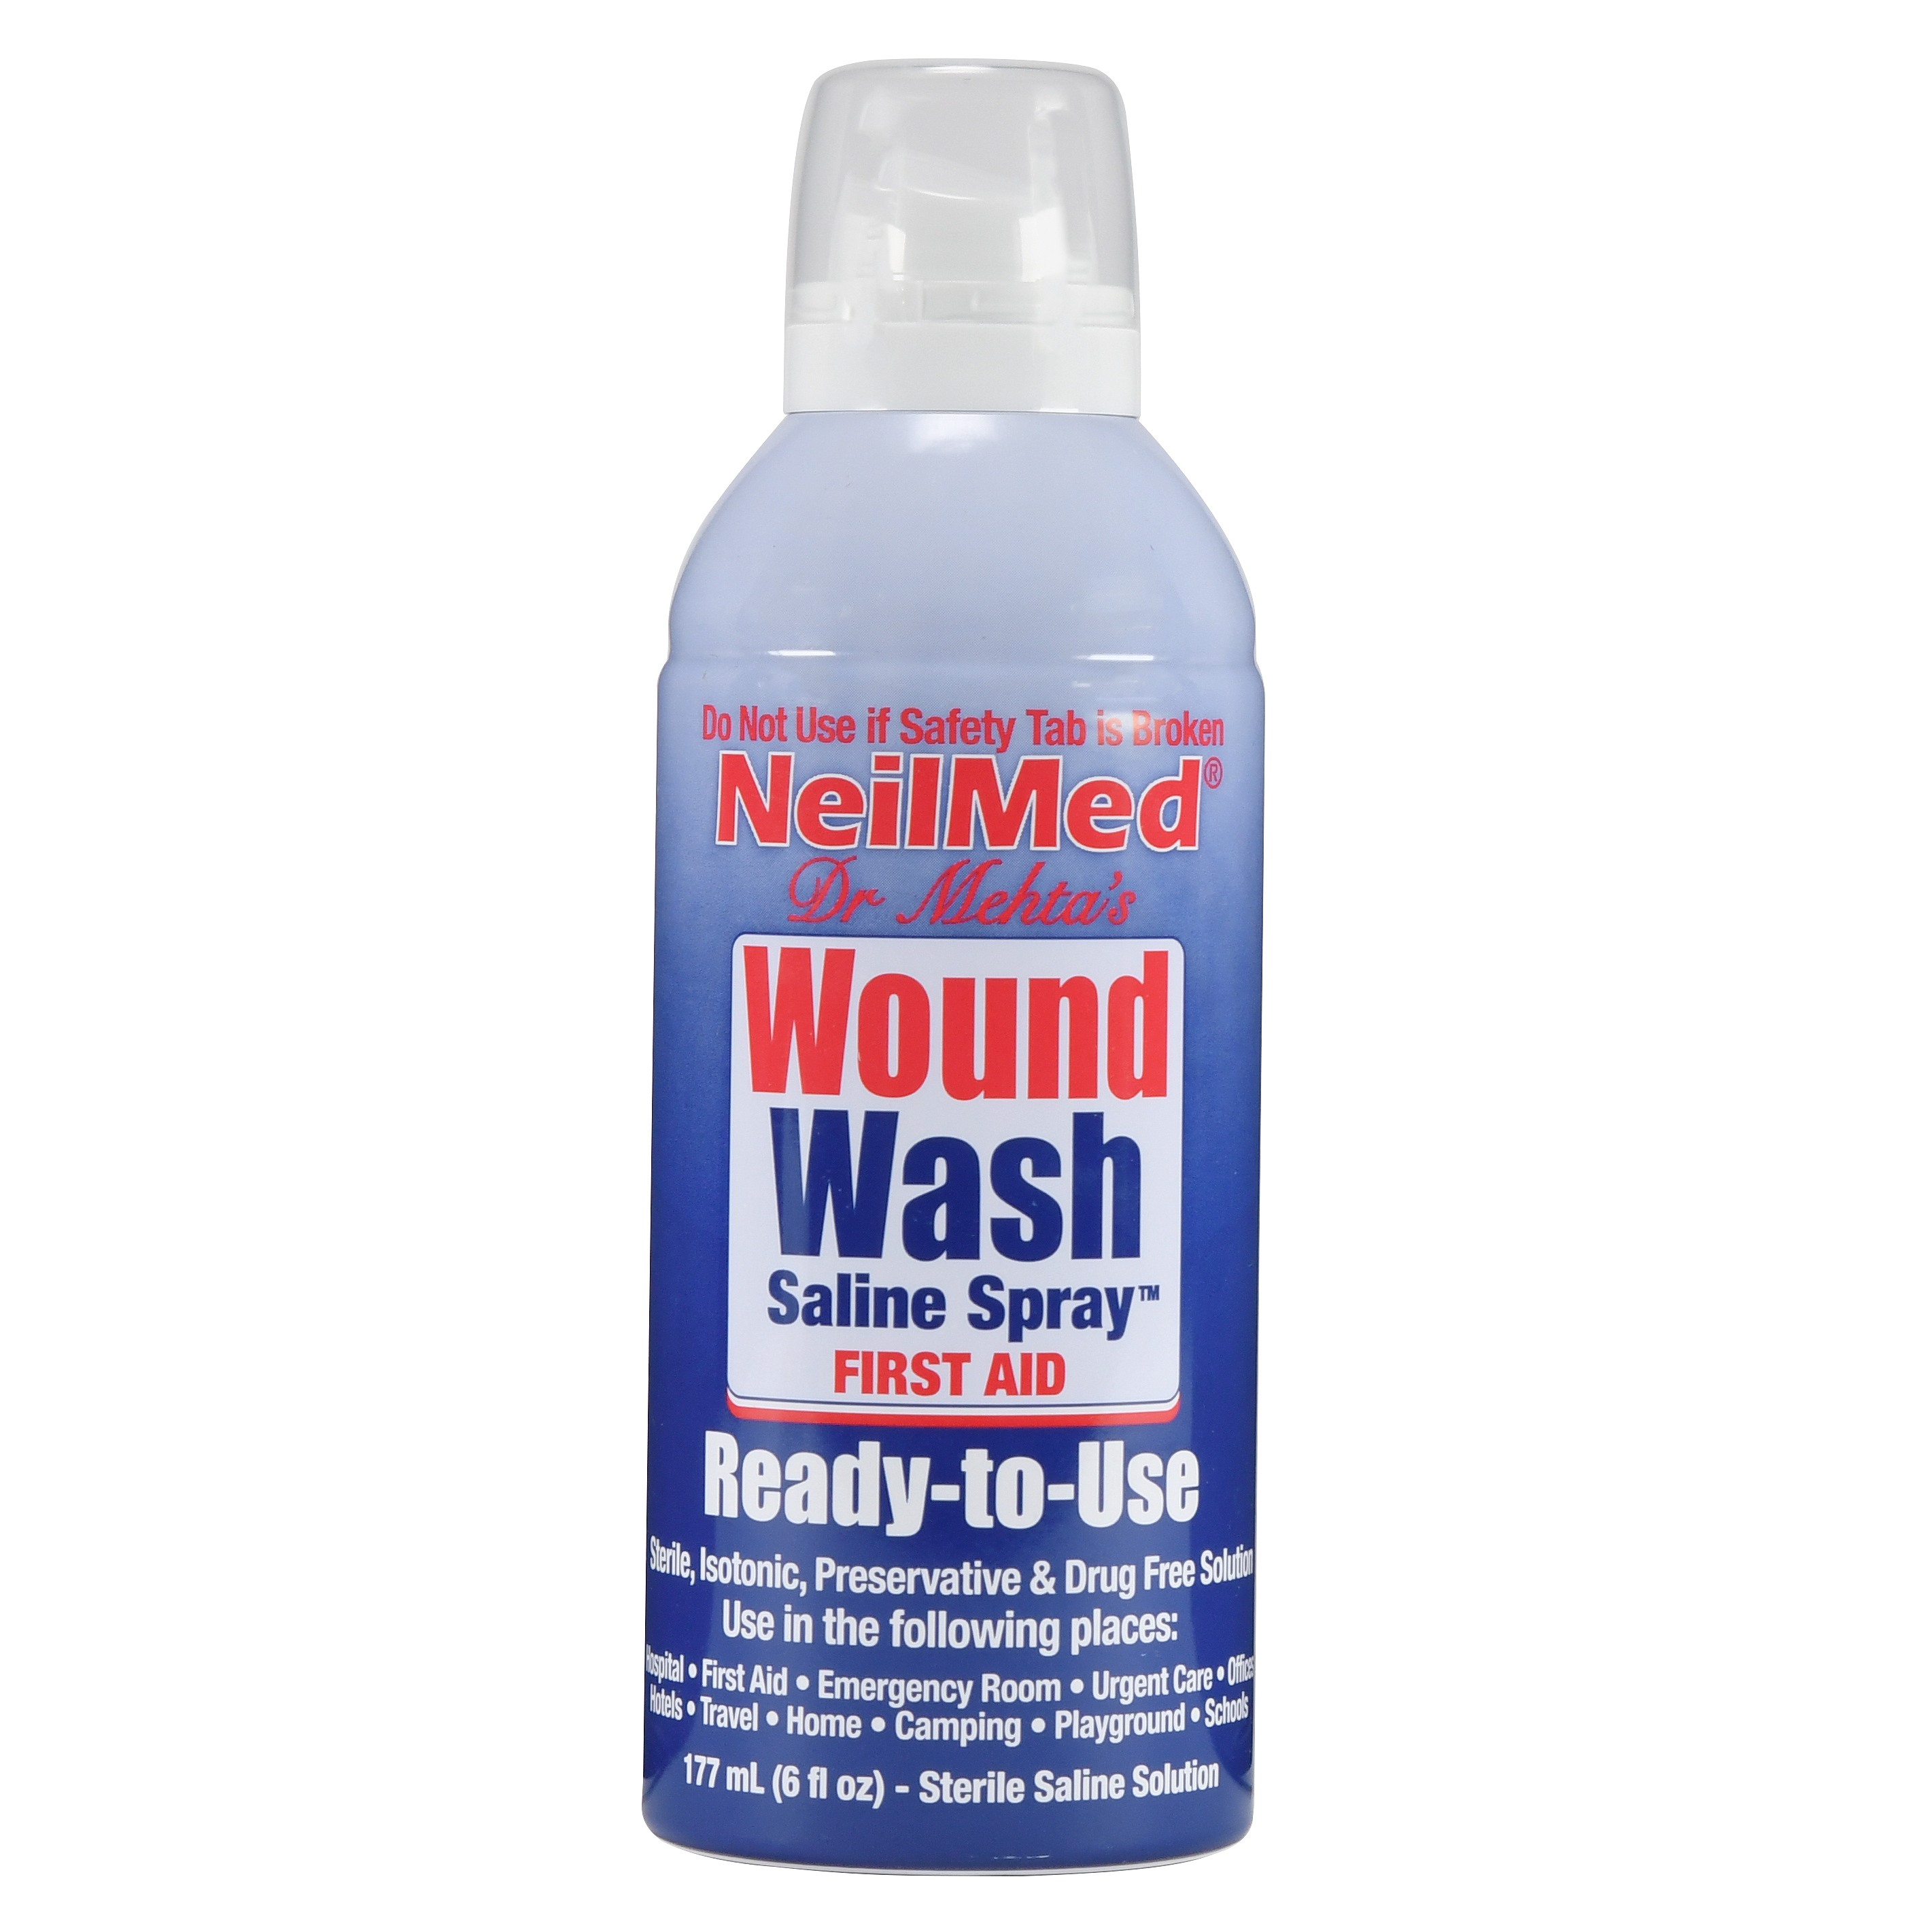 Neilmed Neil Cleanse Sterile Saline Solution Wound Wash 6 Fl Oz